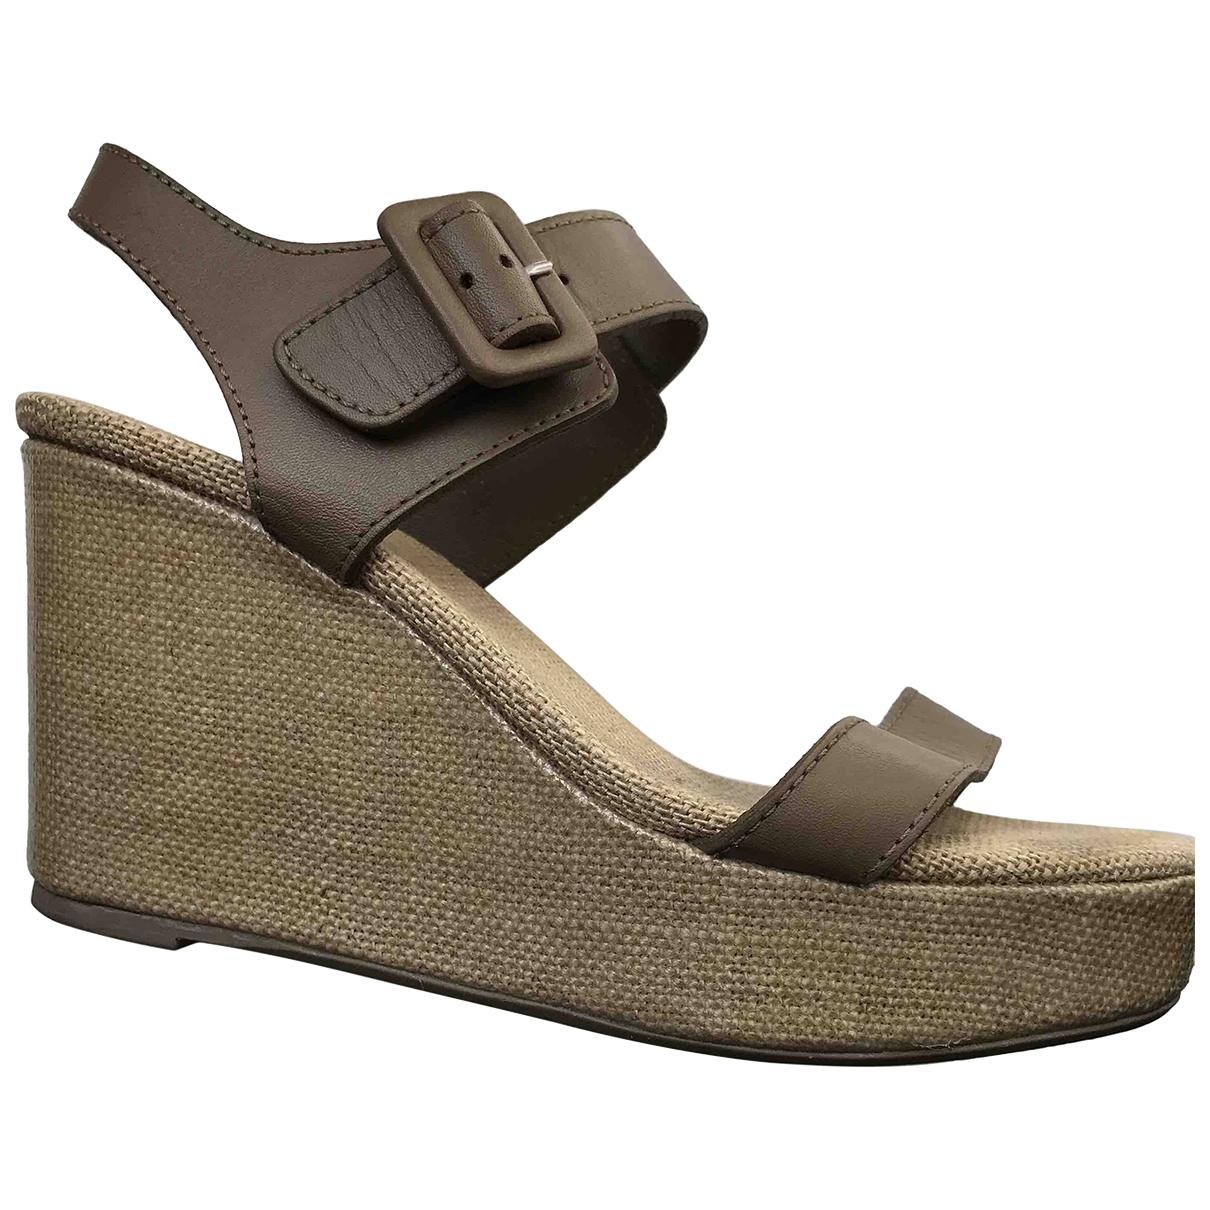 Castaner \N Ecru Leather Sandals for Women 36 IT